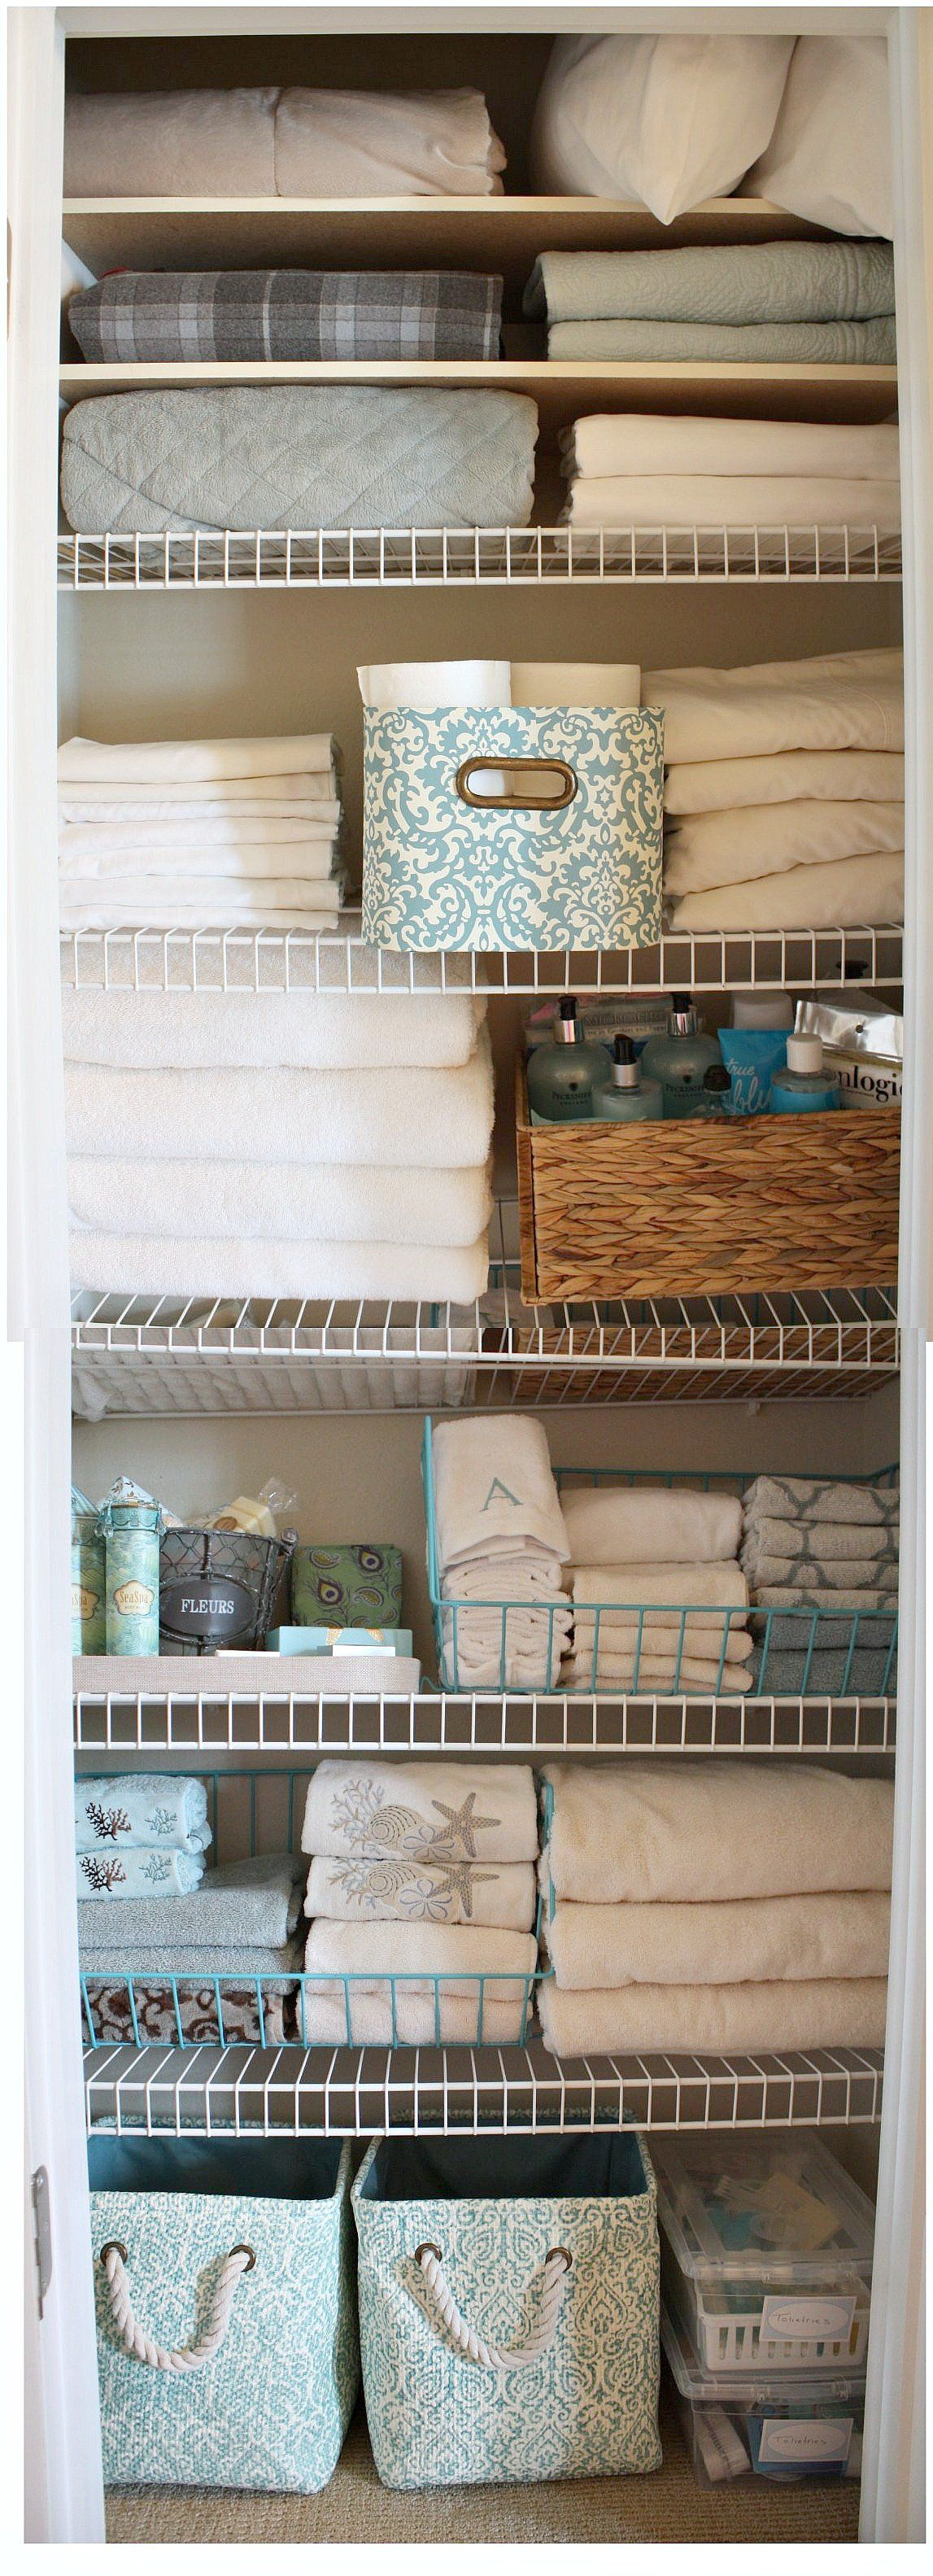 Linen Closet Revamp With Kirklandu0027s Pretty Storage Pieces. The Creativity  Exchange